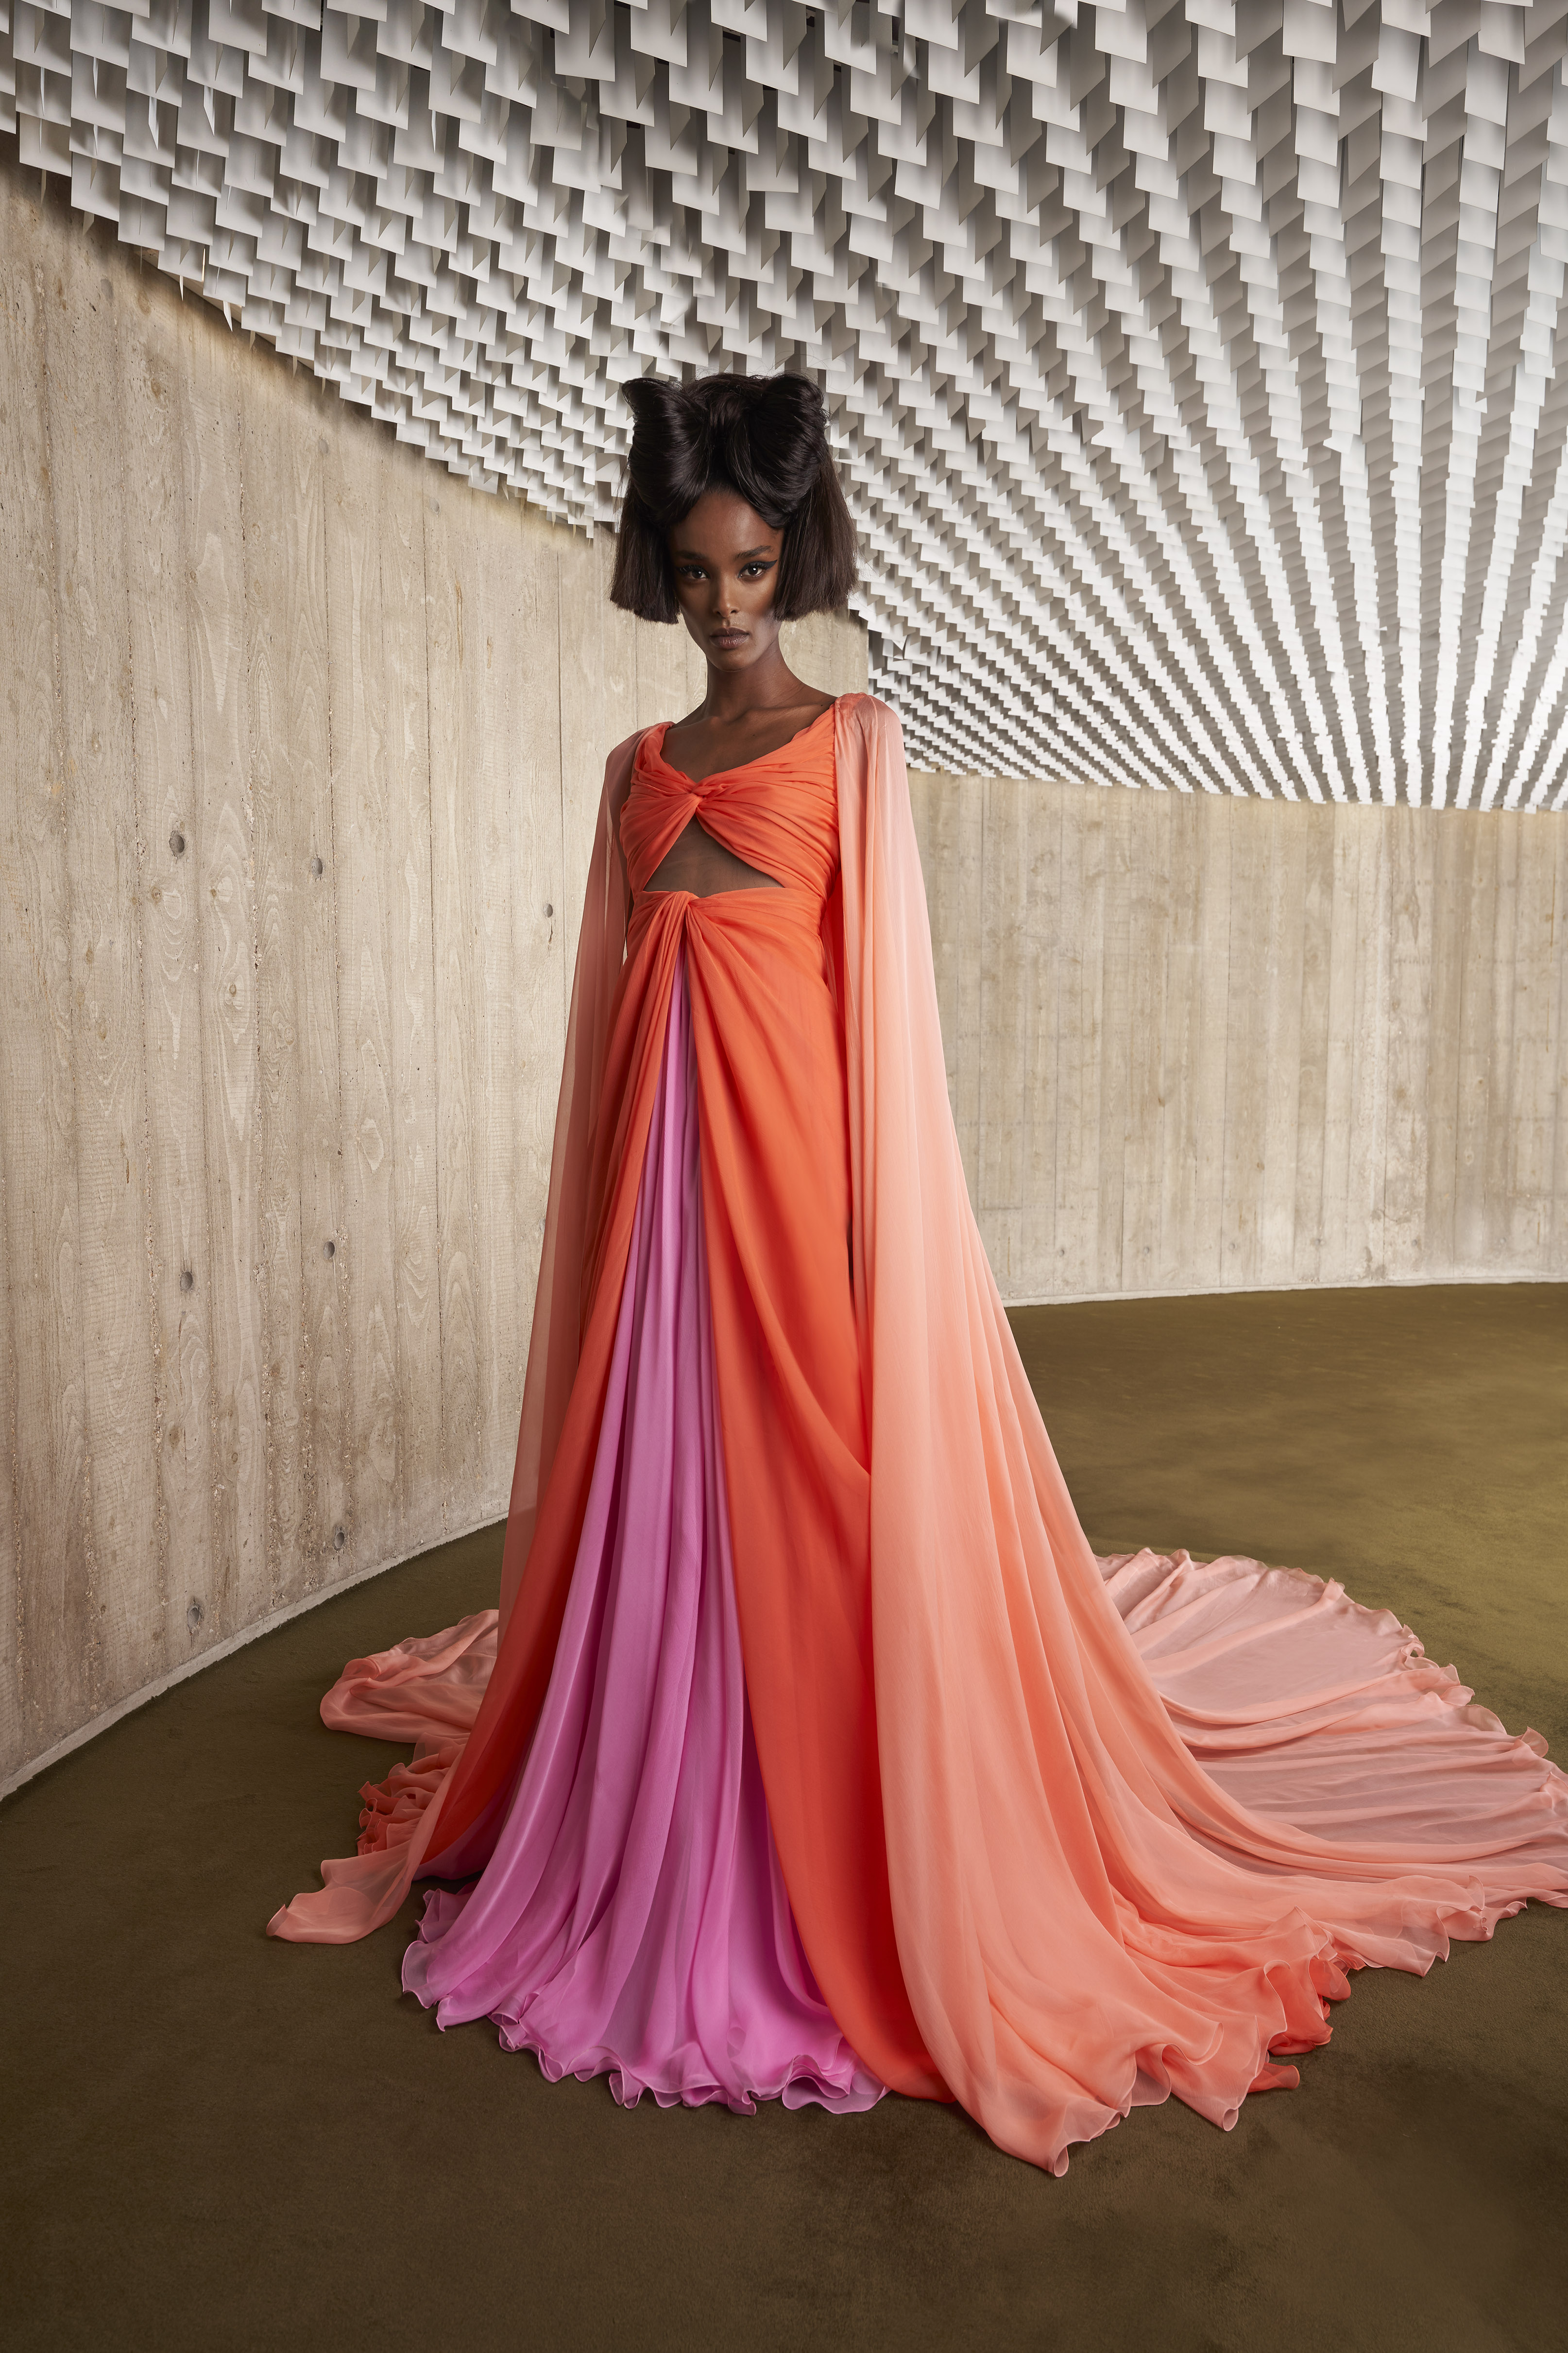 Courtesy of Giambattista Valli  Imagery and video shot at Espace Niemeyer  © NIEMEYER, OSCAR / Adagp, Paris, 2021